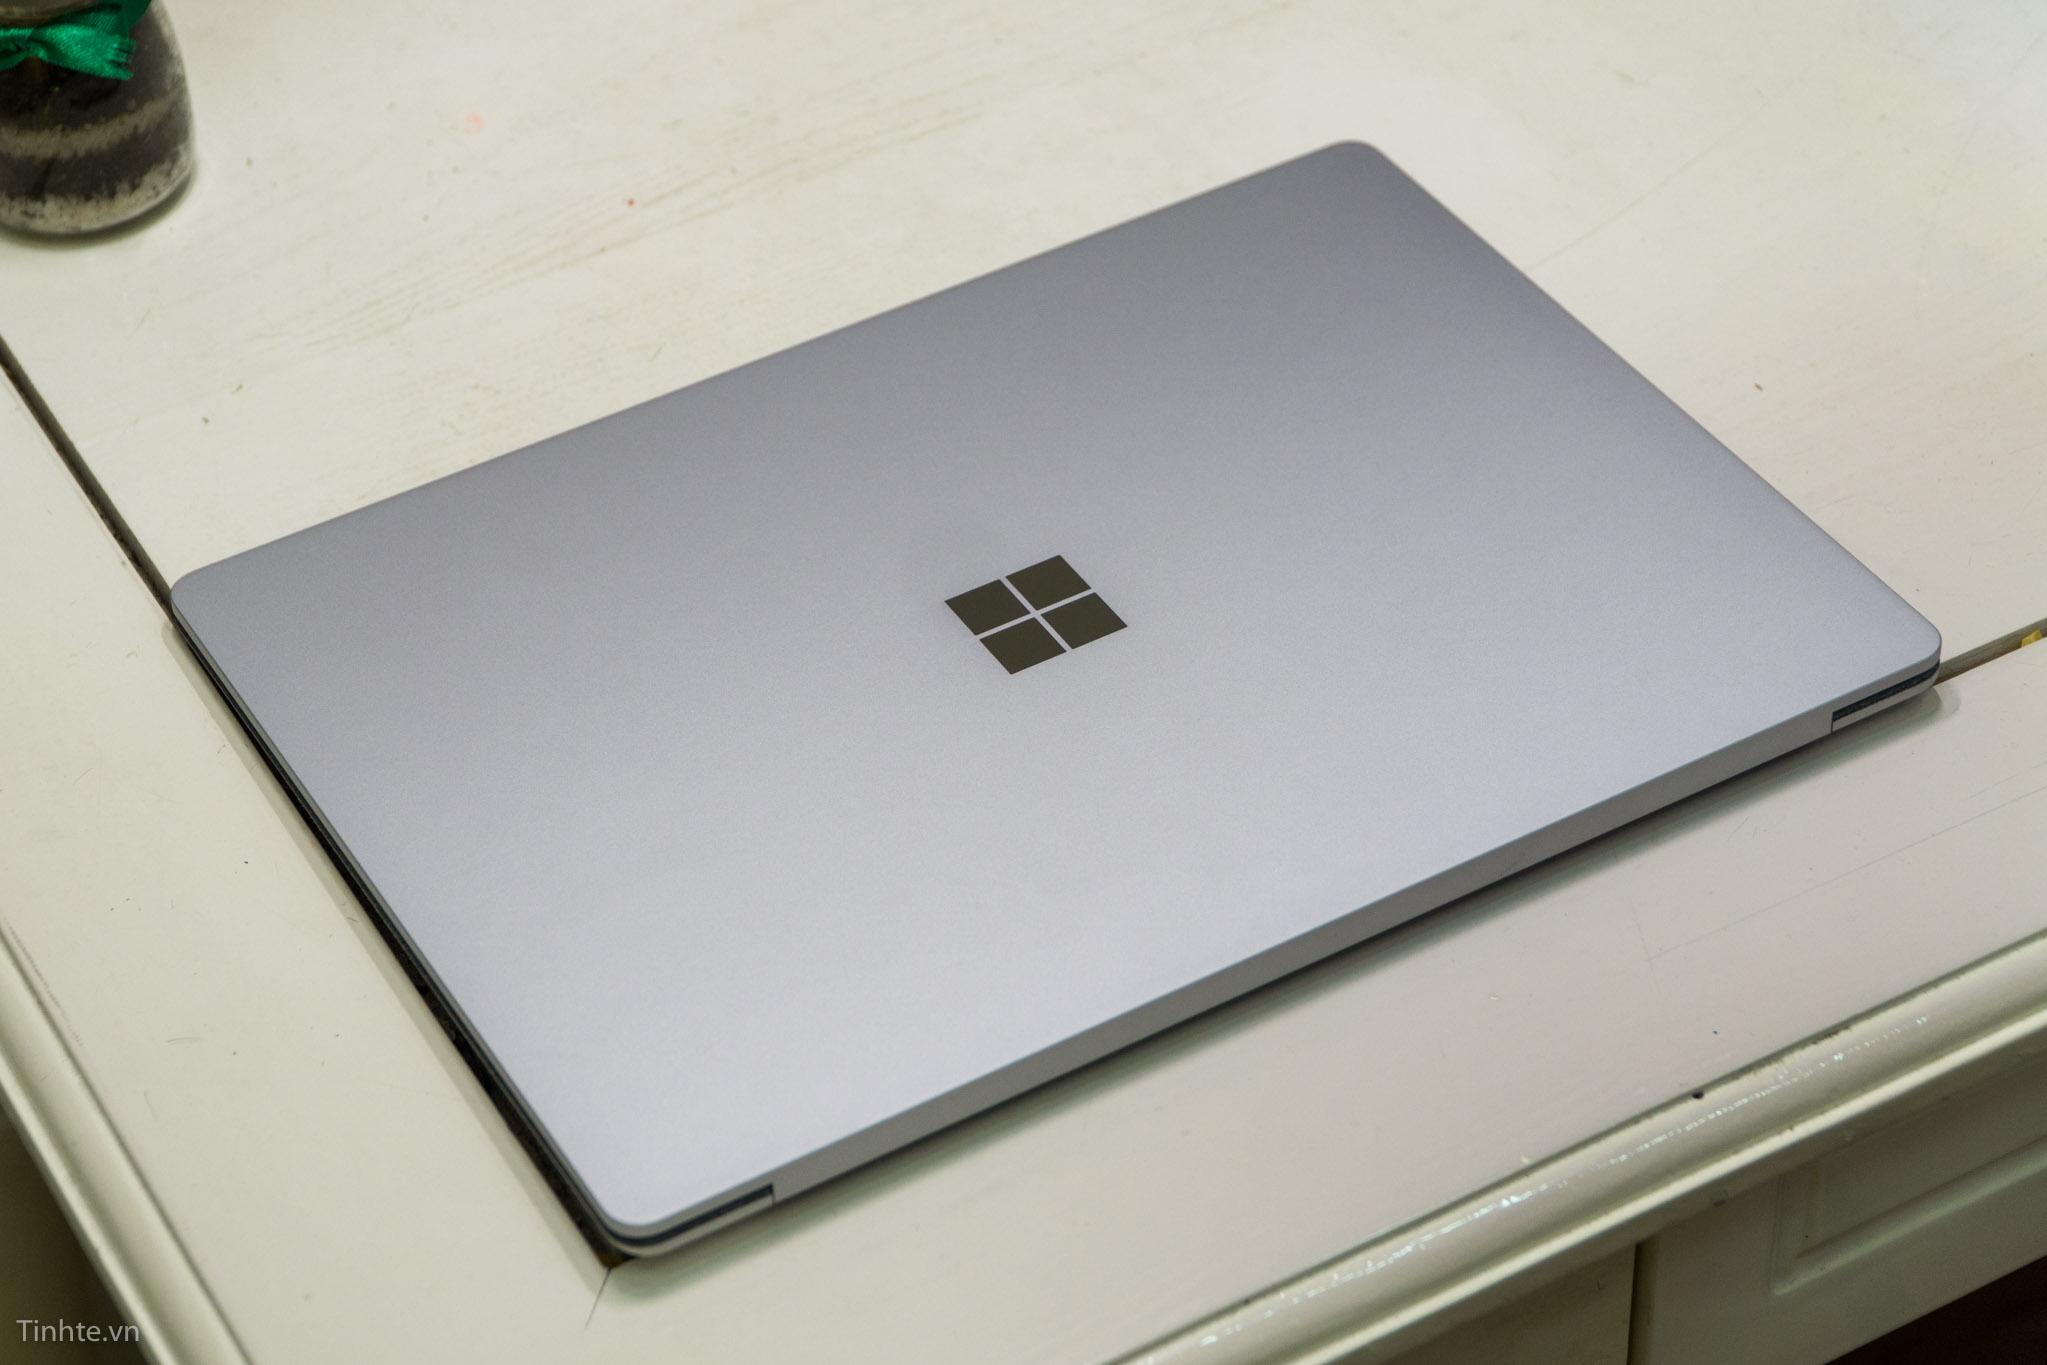 surface_laptop_tinhte-1.jpg